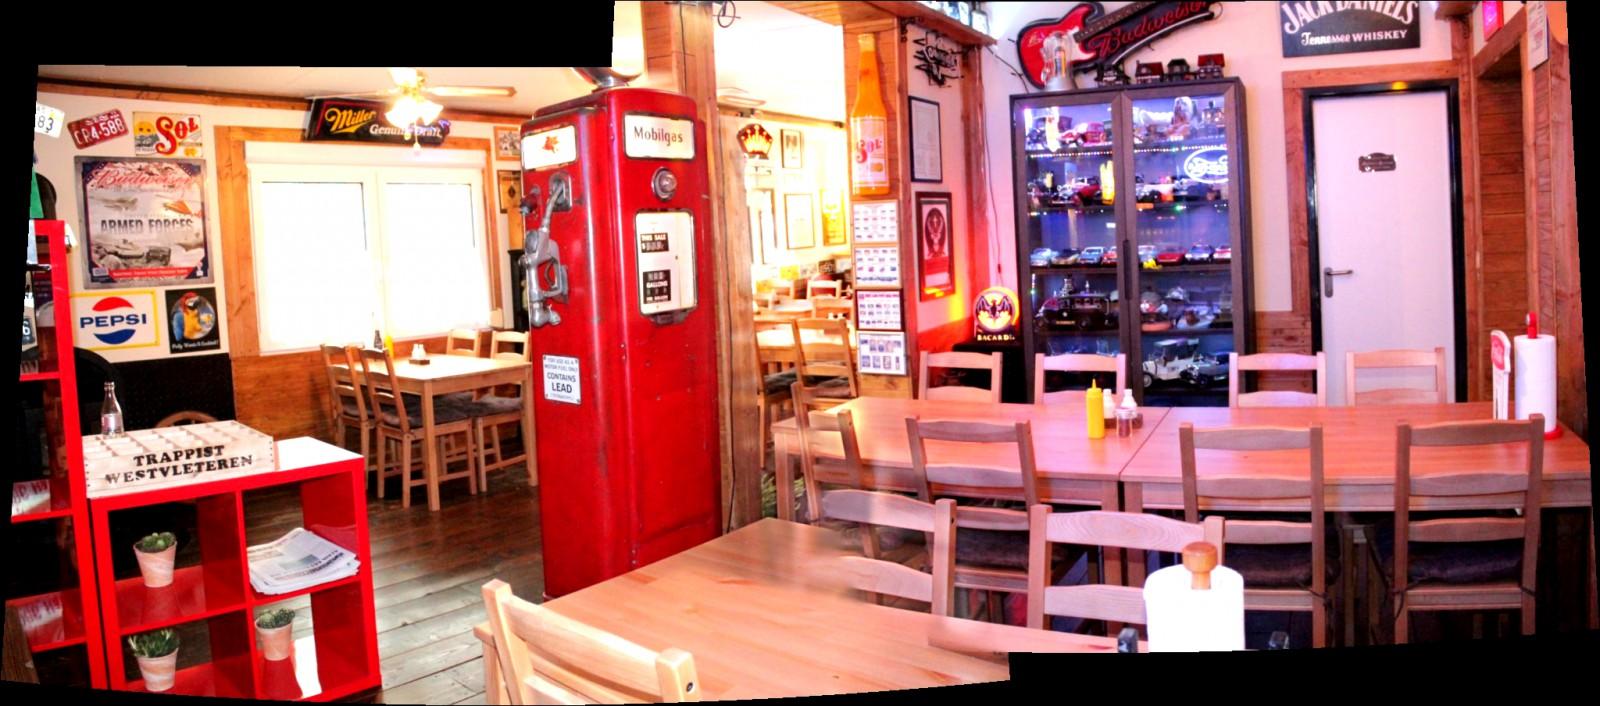 Restaurant Roadhouse Ktown in Kaiserslautern